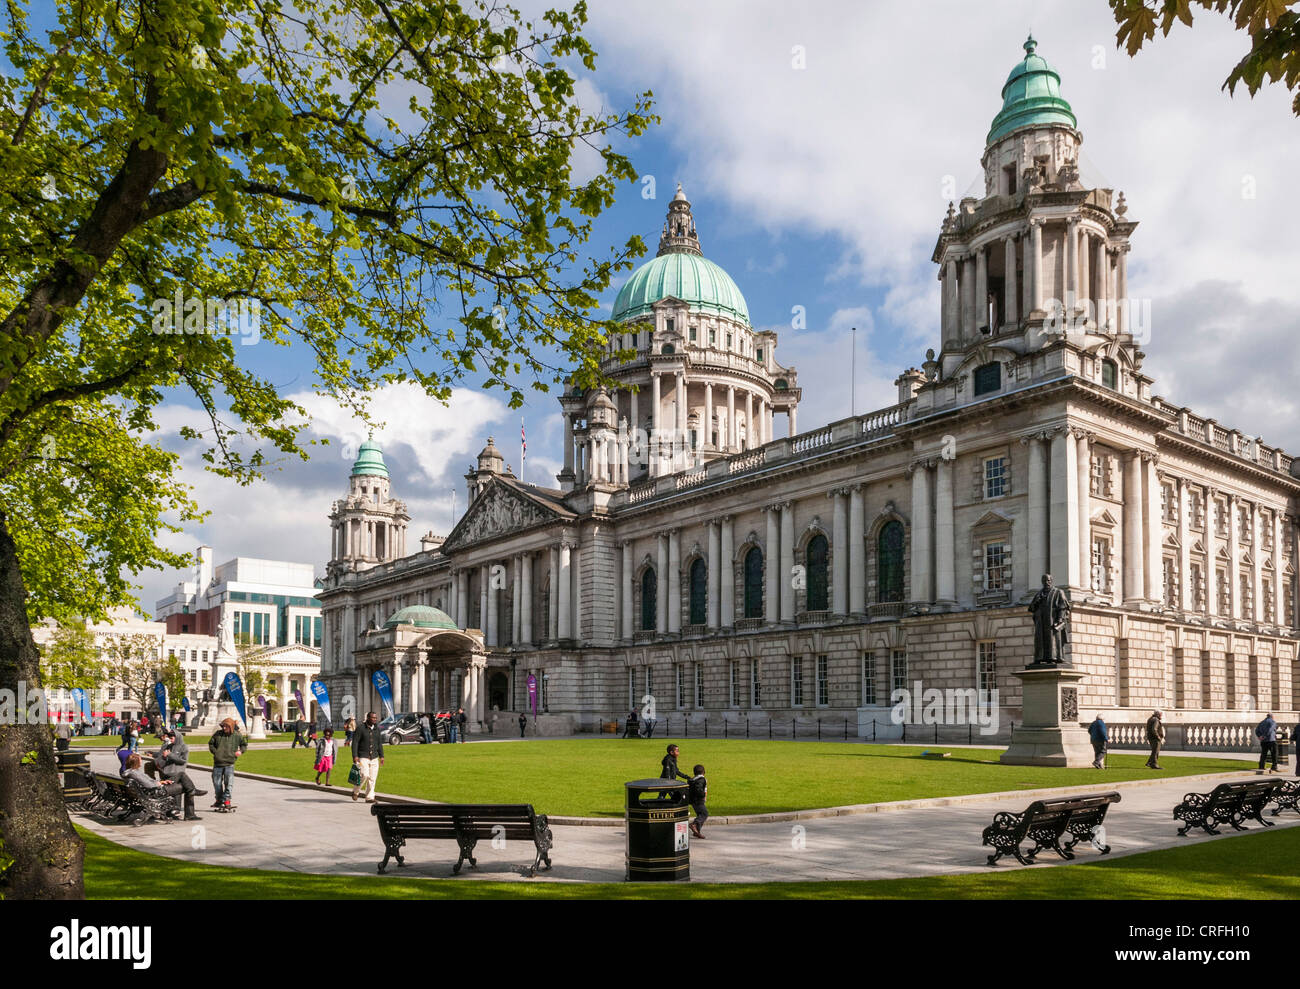 Belfast City Hall, Belfast, Northern Ireland - Stock Image